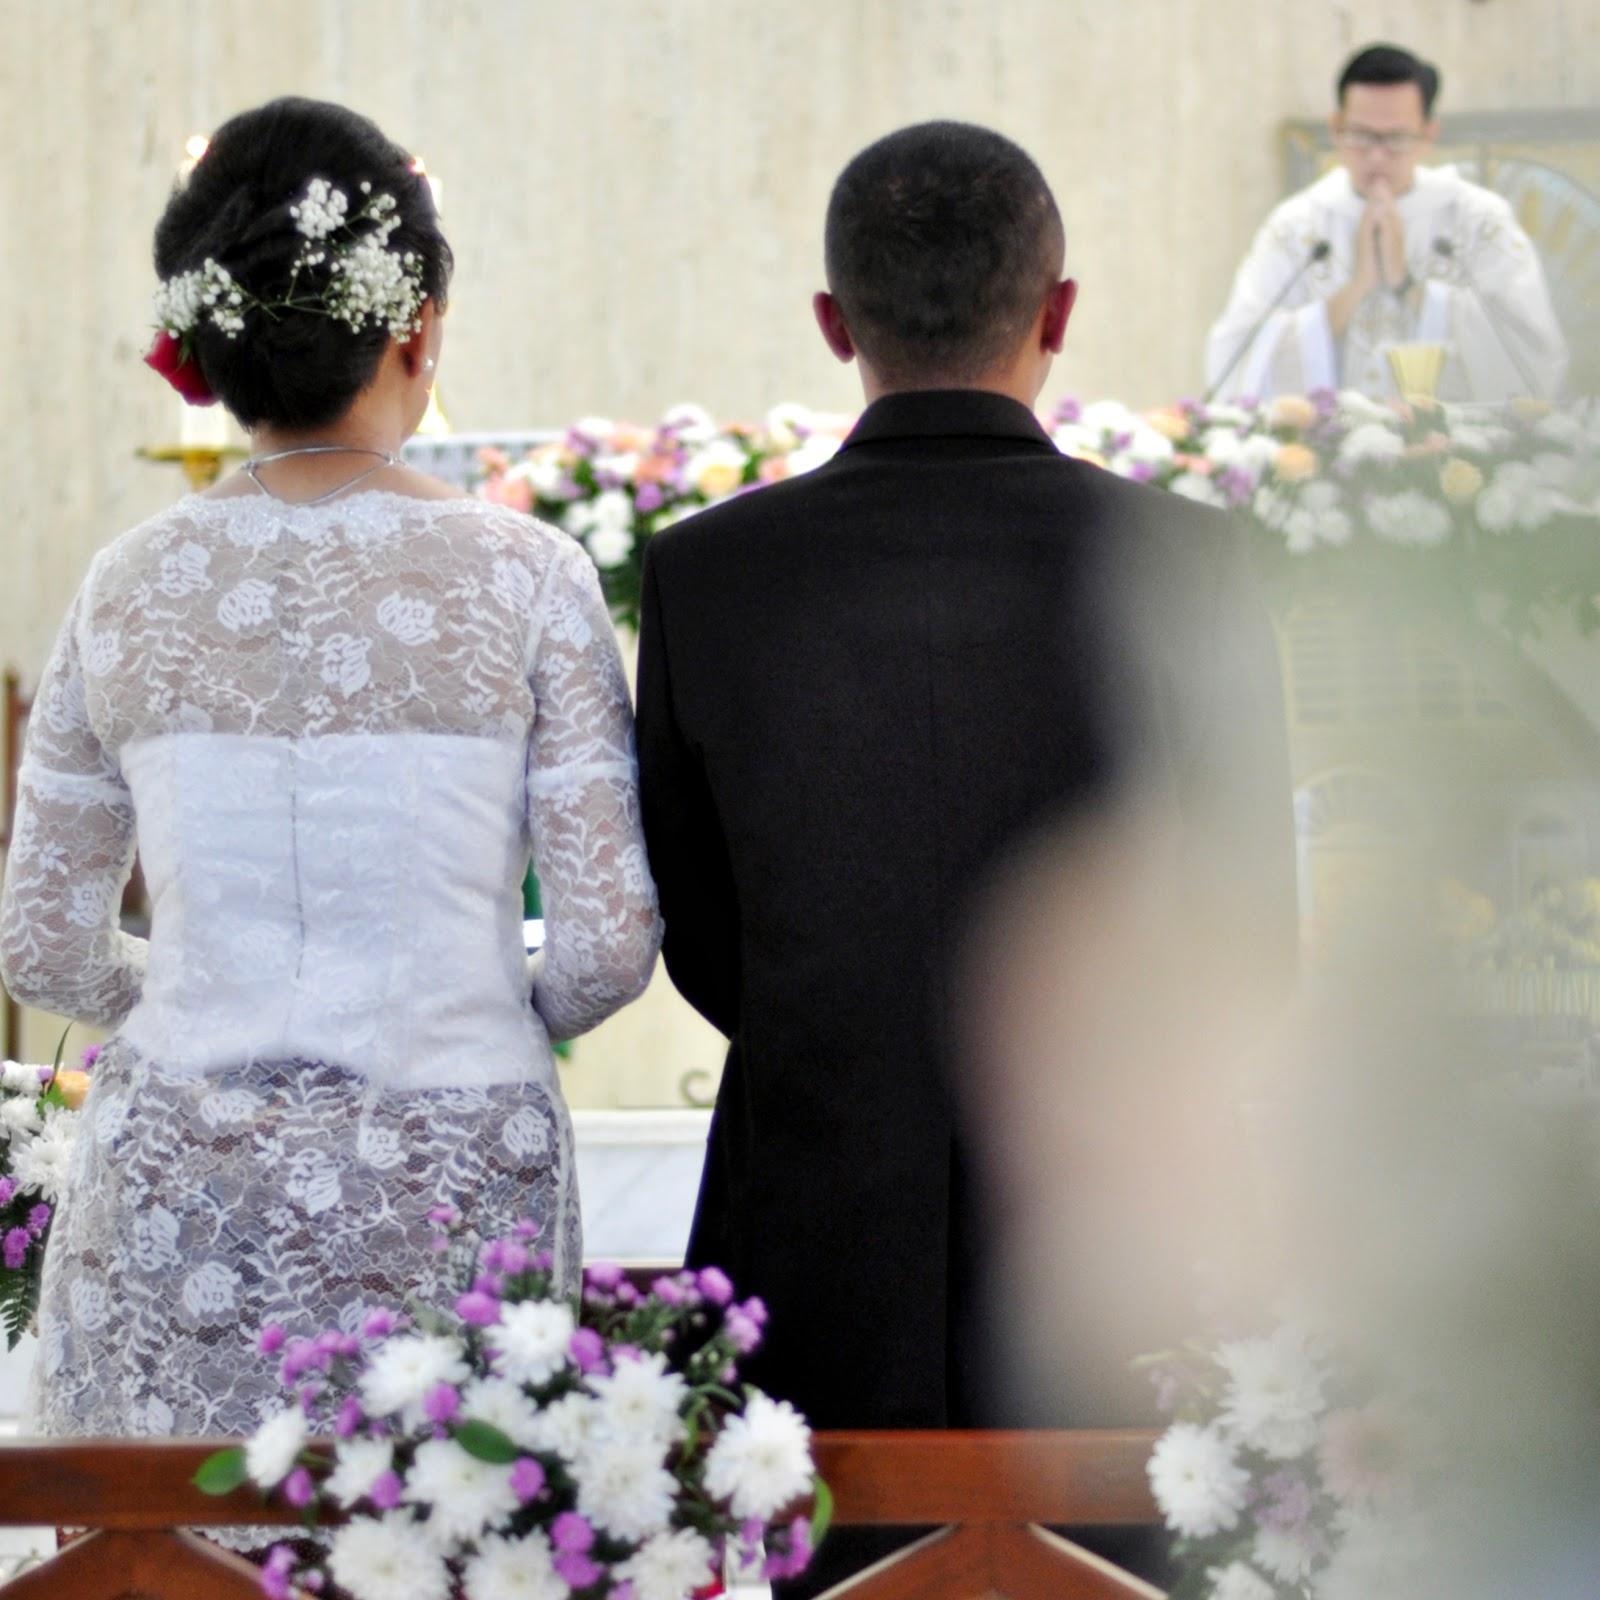 Perkawinan Dalam Gereja Katolik, Kasus Perkawinan Katolik Di Sagki 2015 17 Tahun Cerai Lalu Menikahi Orang Yang Sama 6 Departemen Dokumentasi Dan Penerangan Kwi